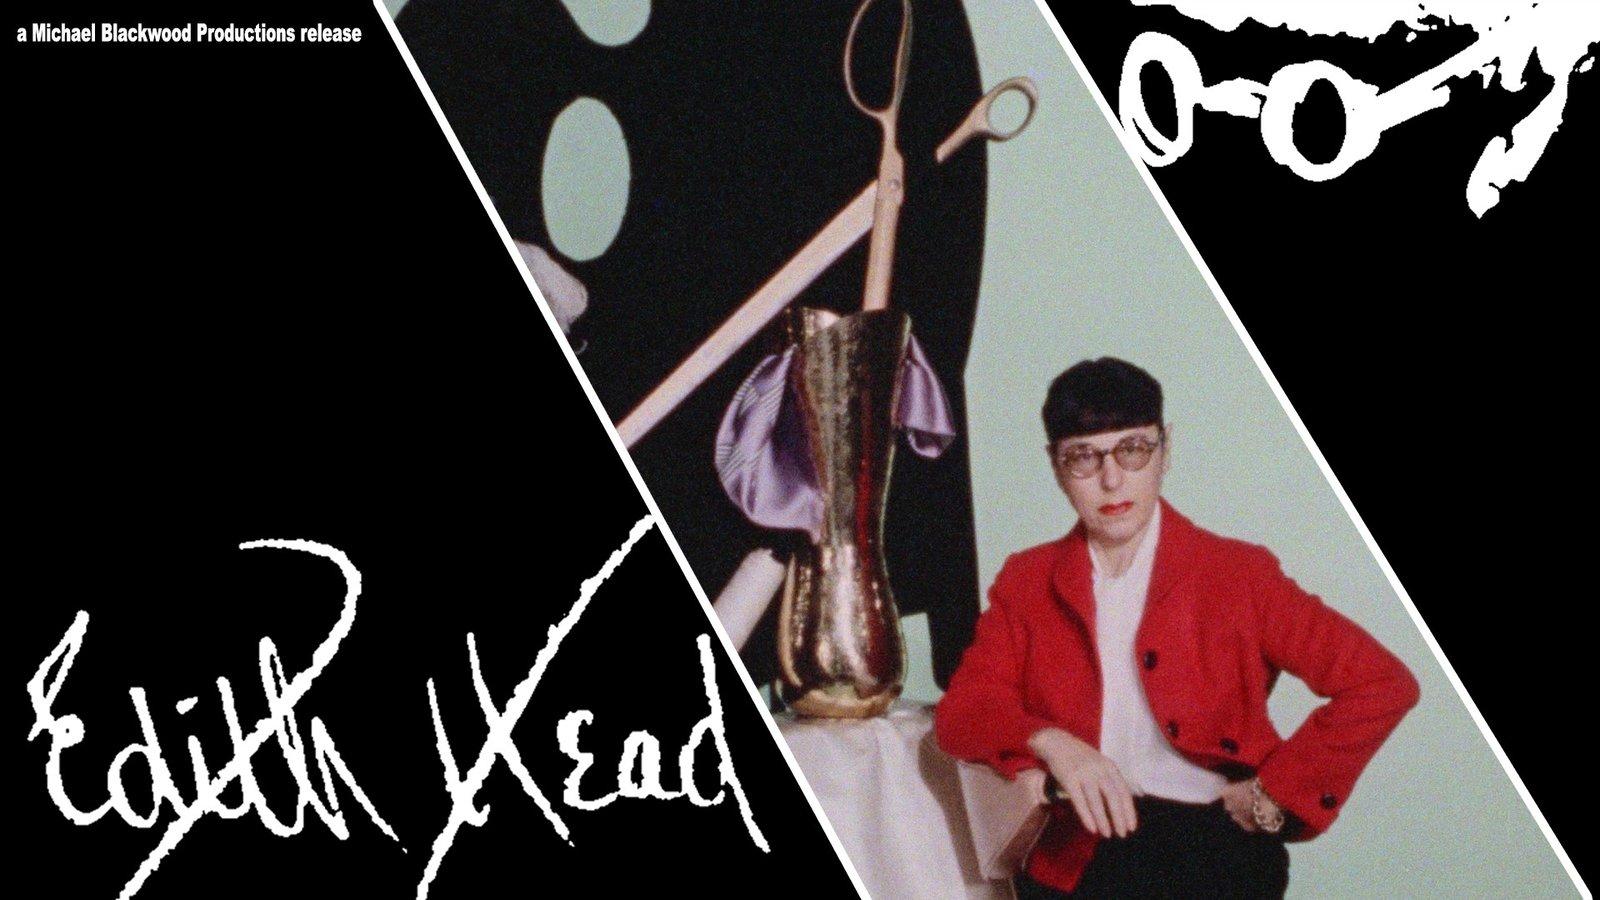 Edith Head - Portrait of a Hollywood Costume Designer